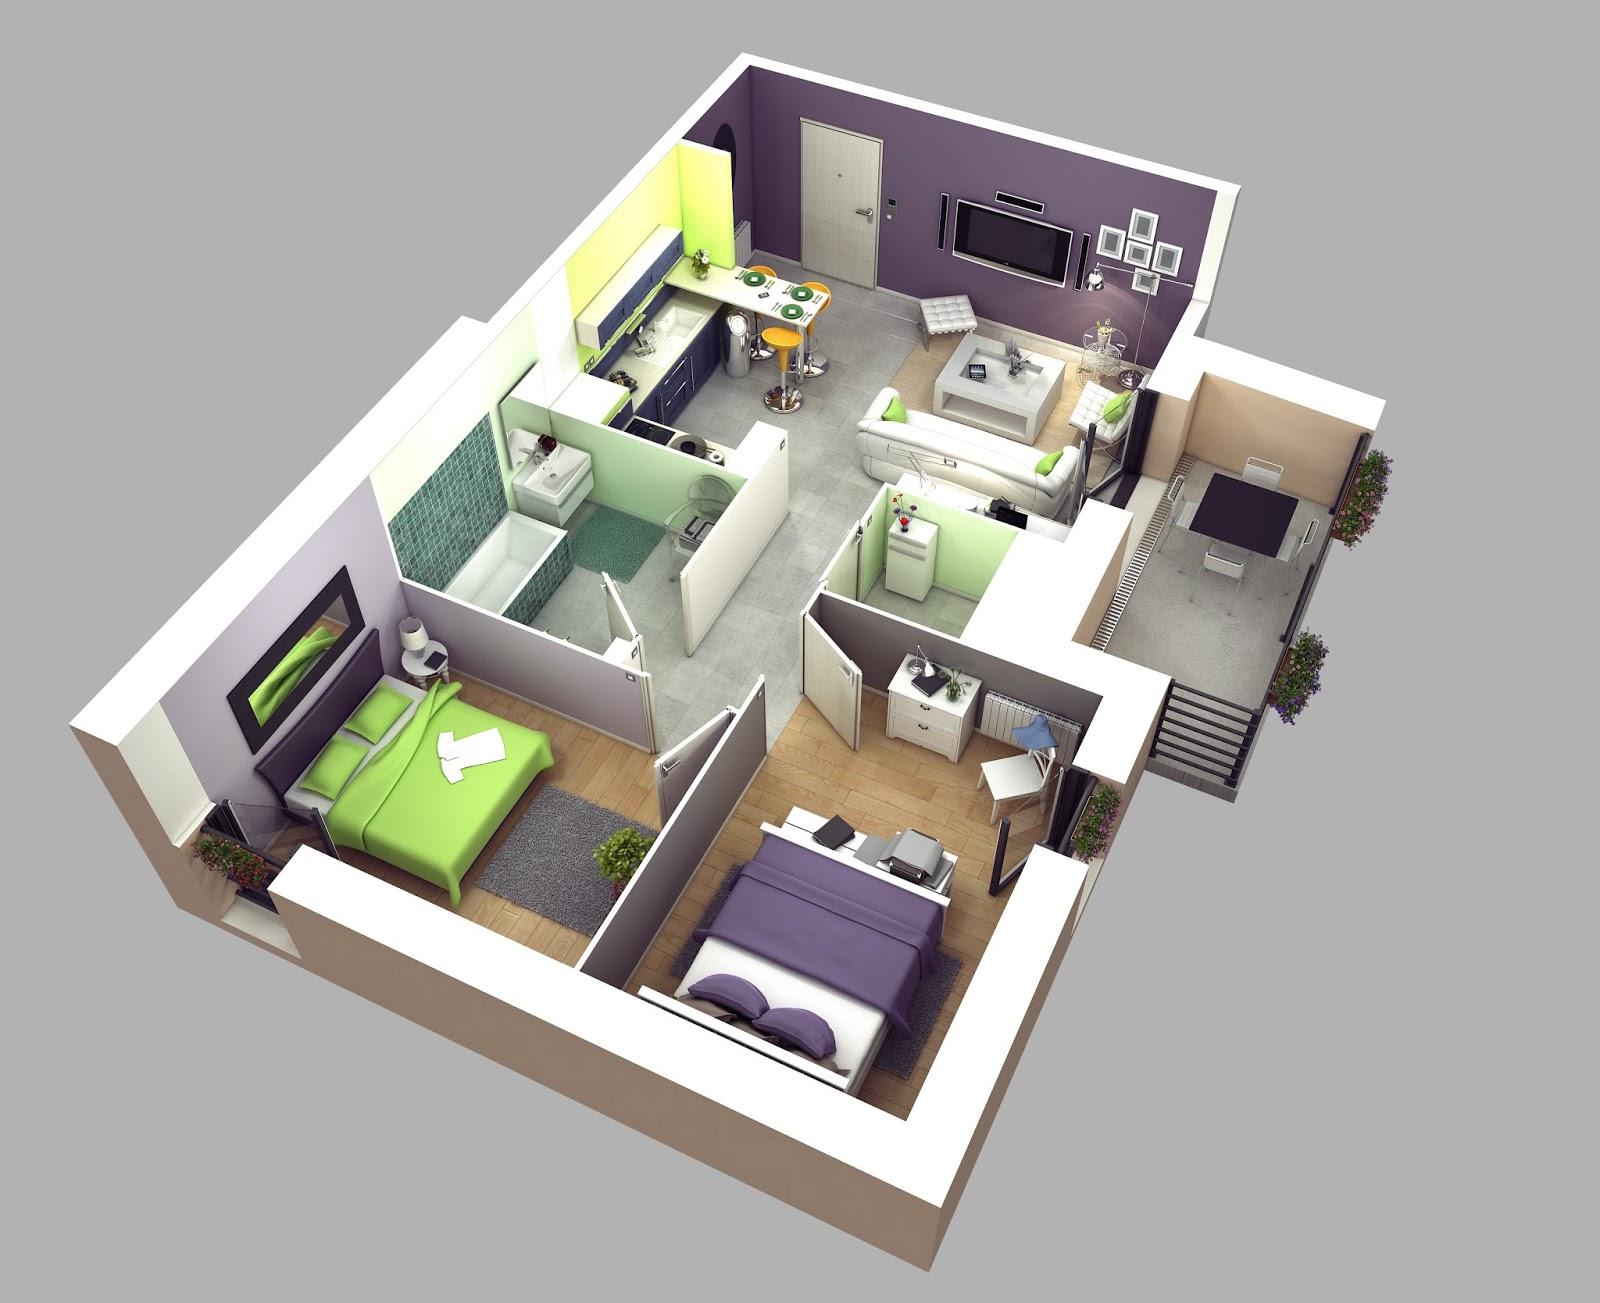 Stylish%2BModern%2BHome%2B3D%2BFloor%2BPlans%2B%25289%2529 Stylish Home 3D Floor Plans Interior